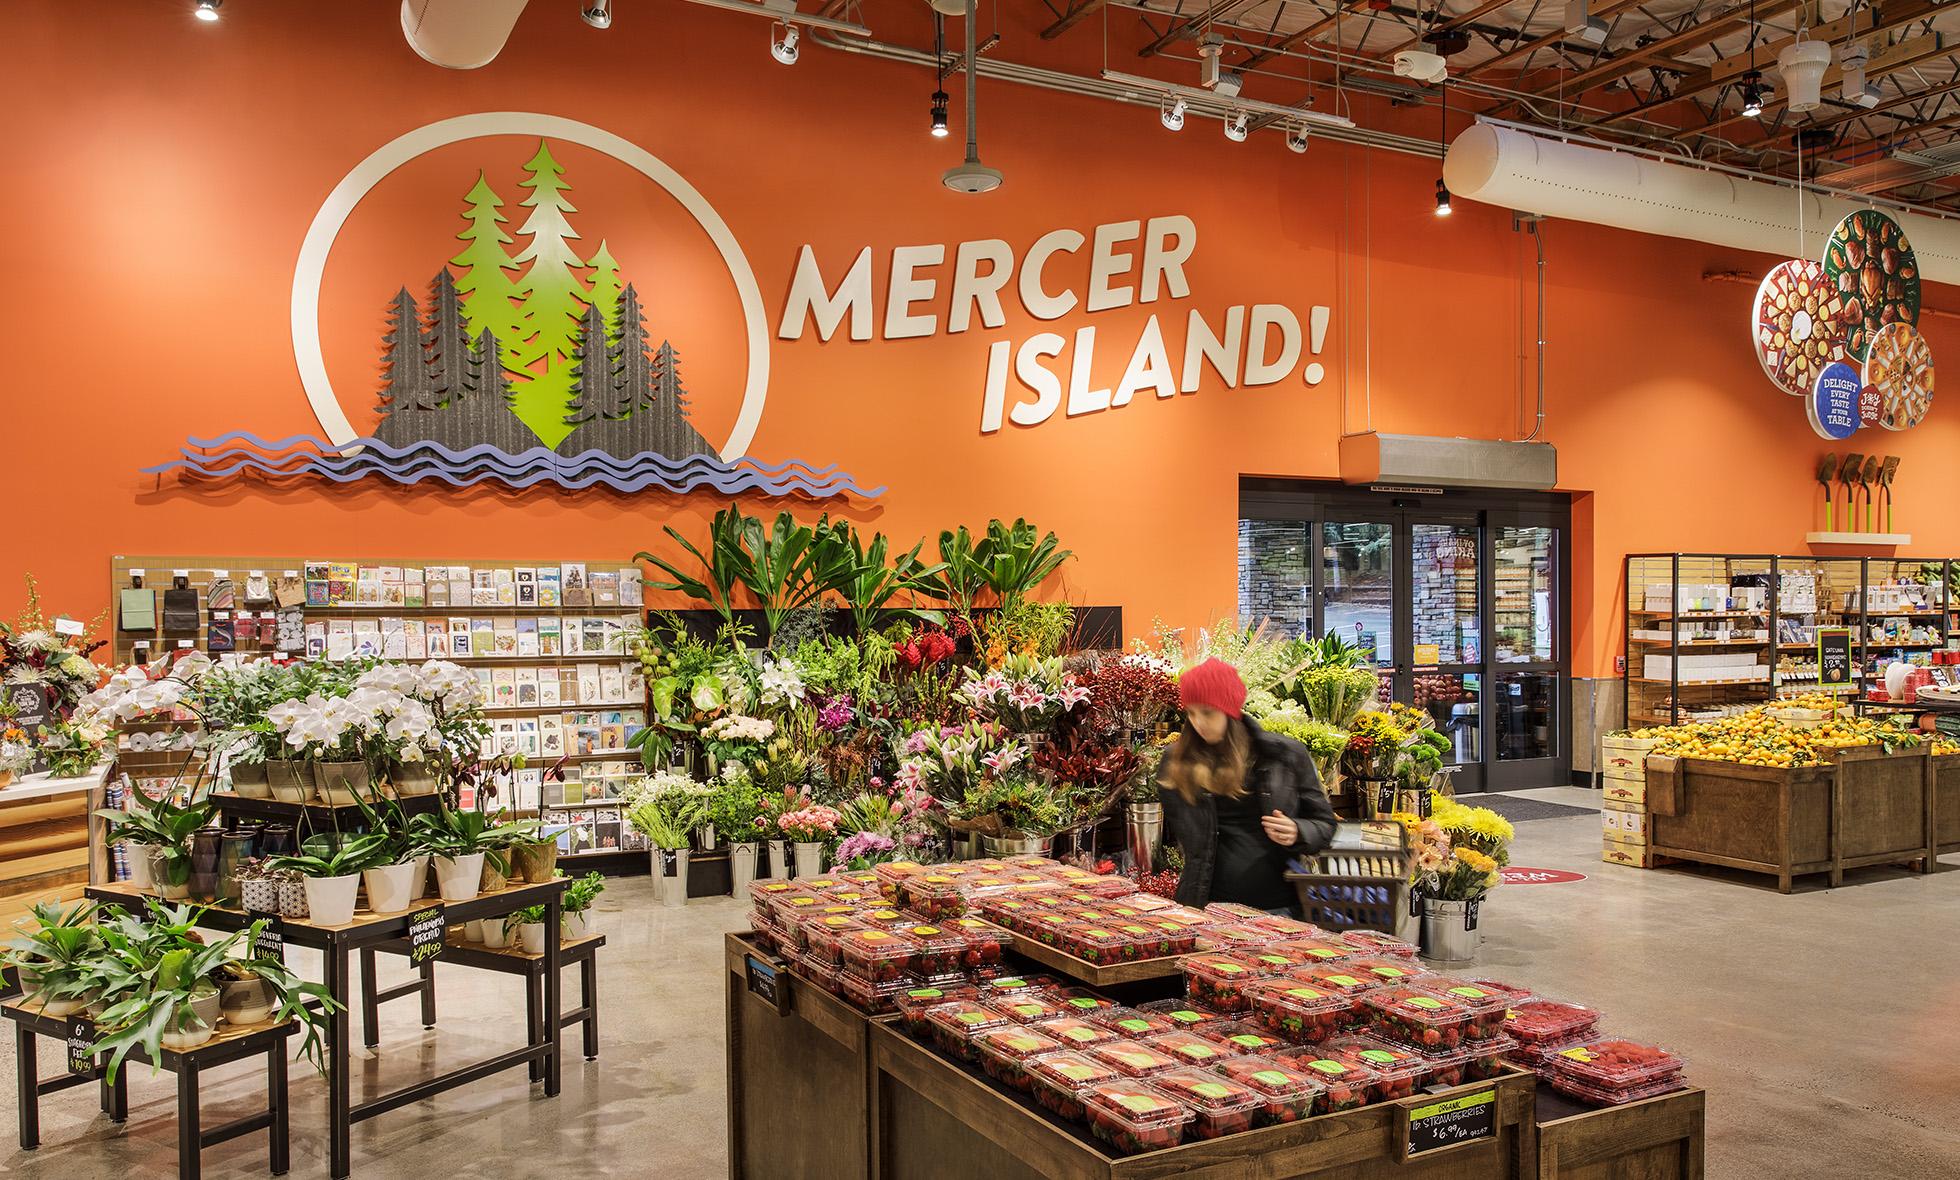 New Seasons Market Mercer Island - 2 Image